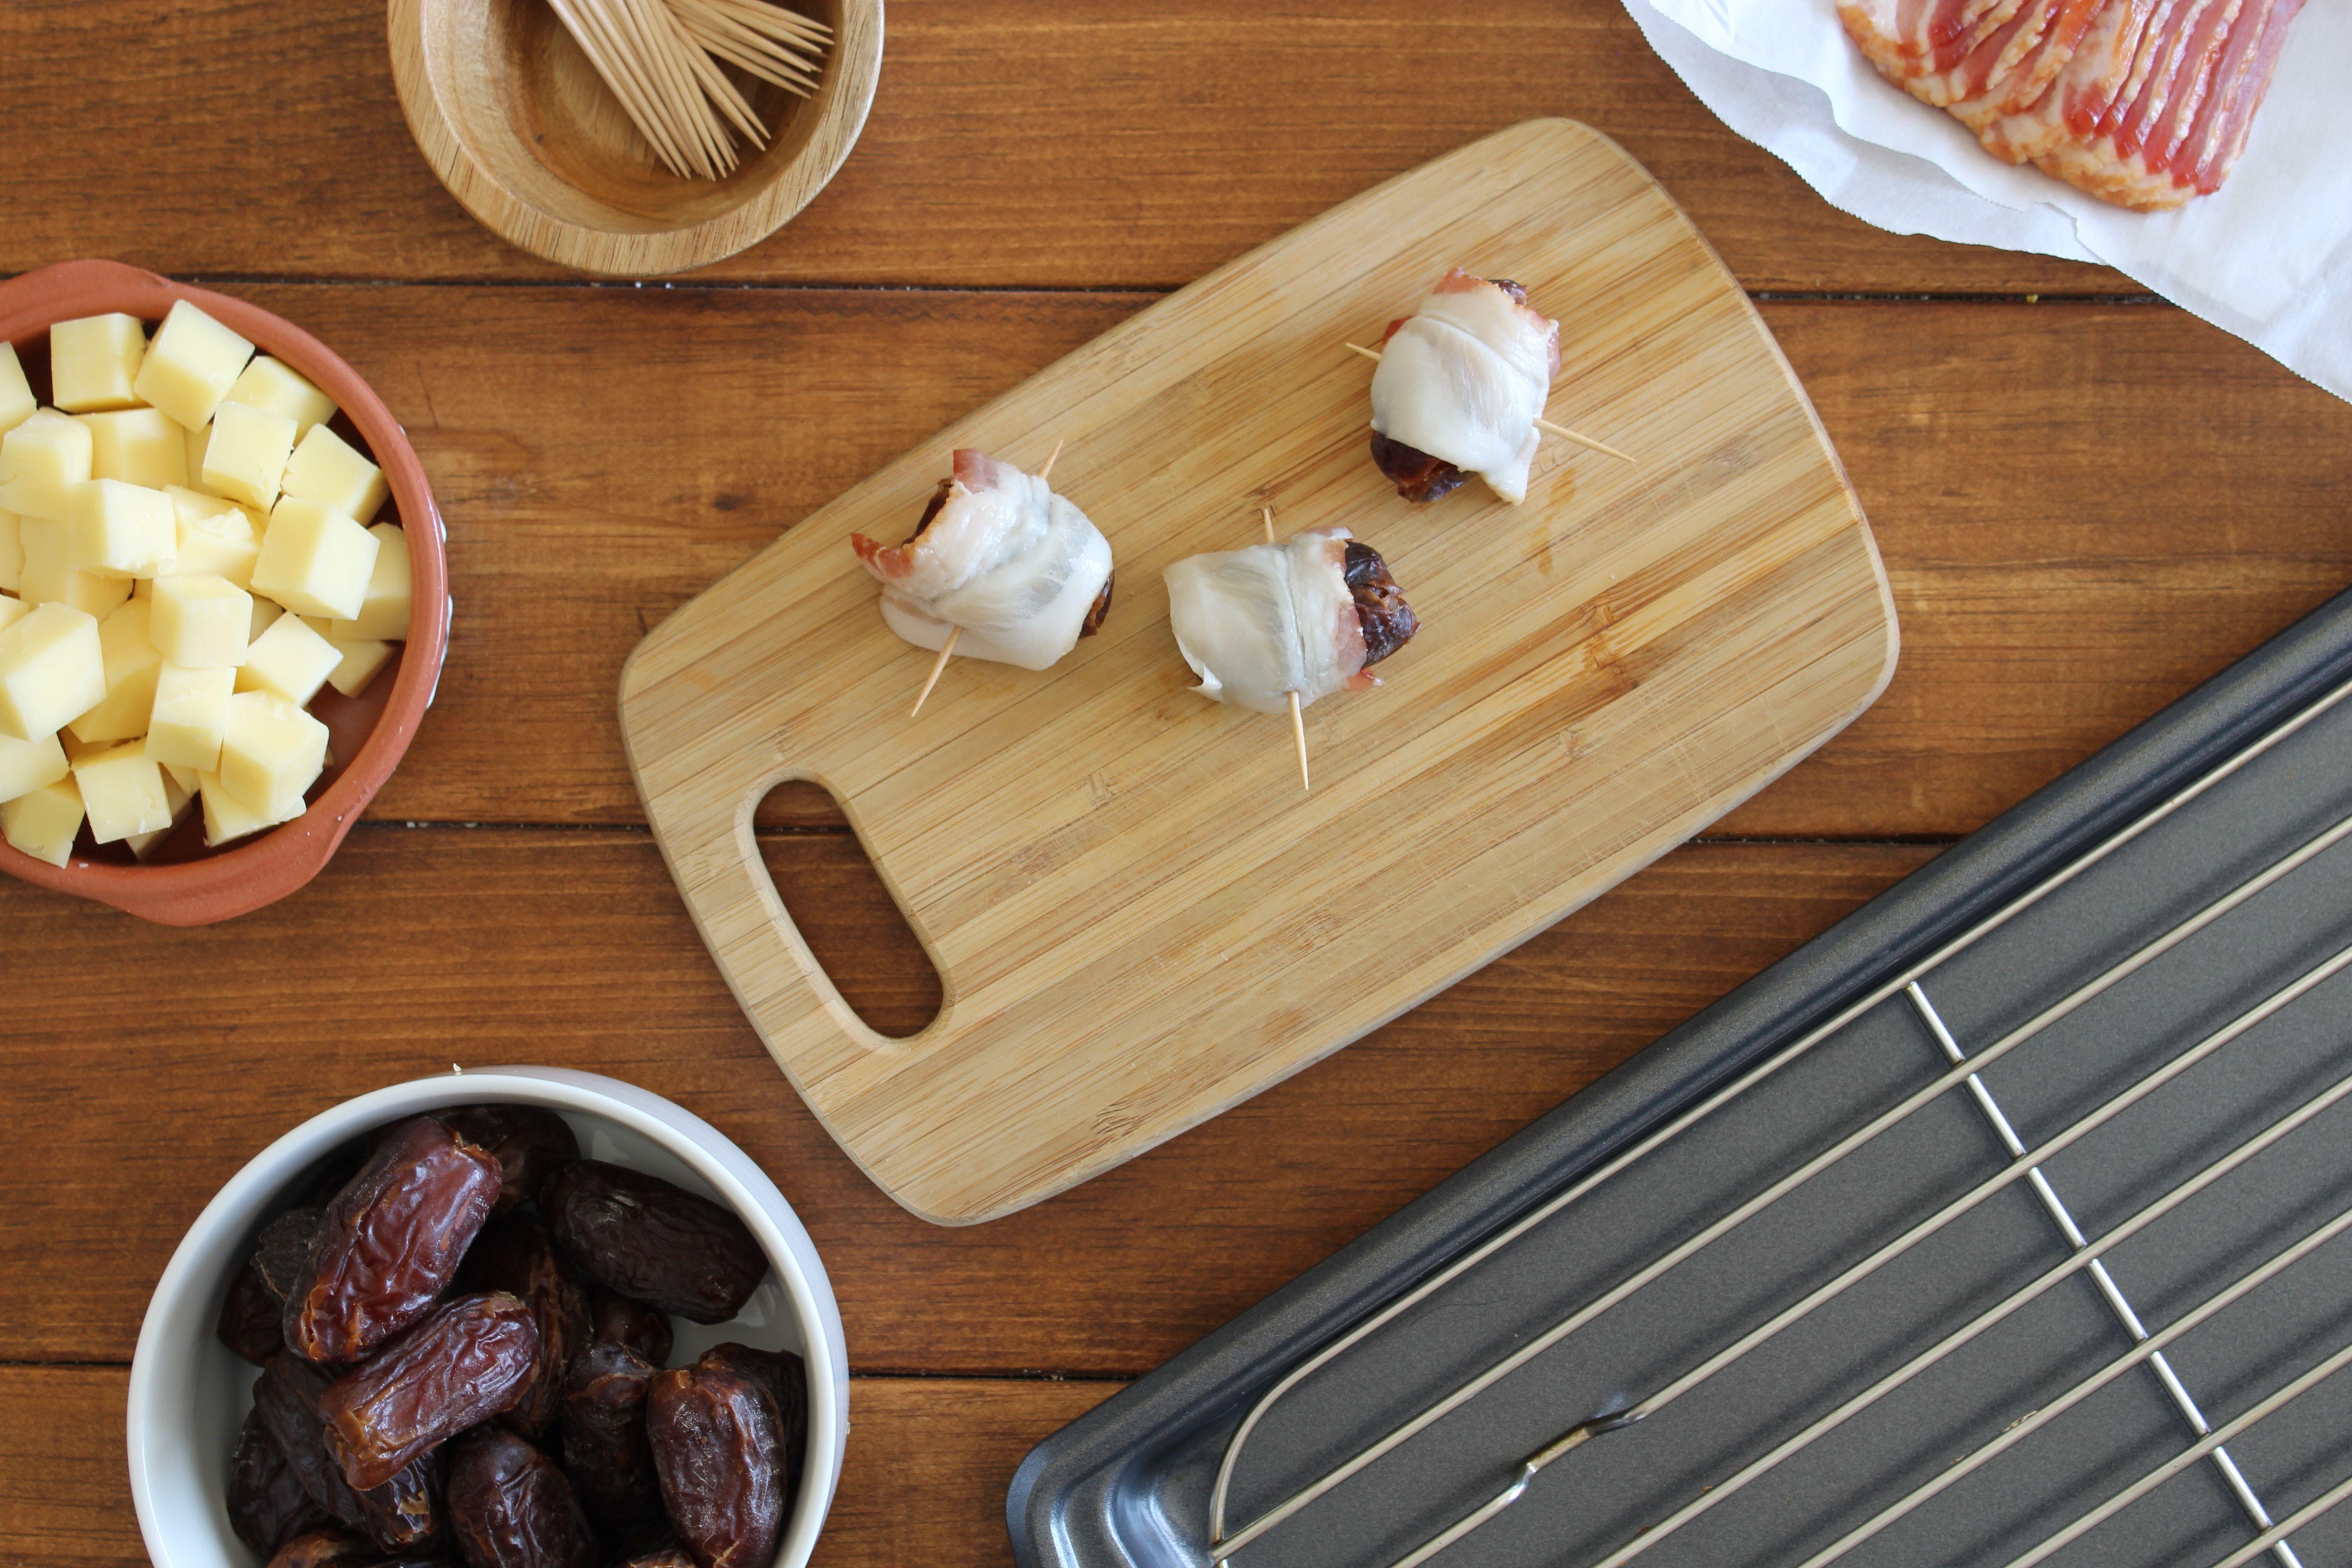 Wrap bacon around date